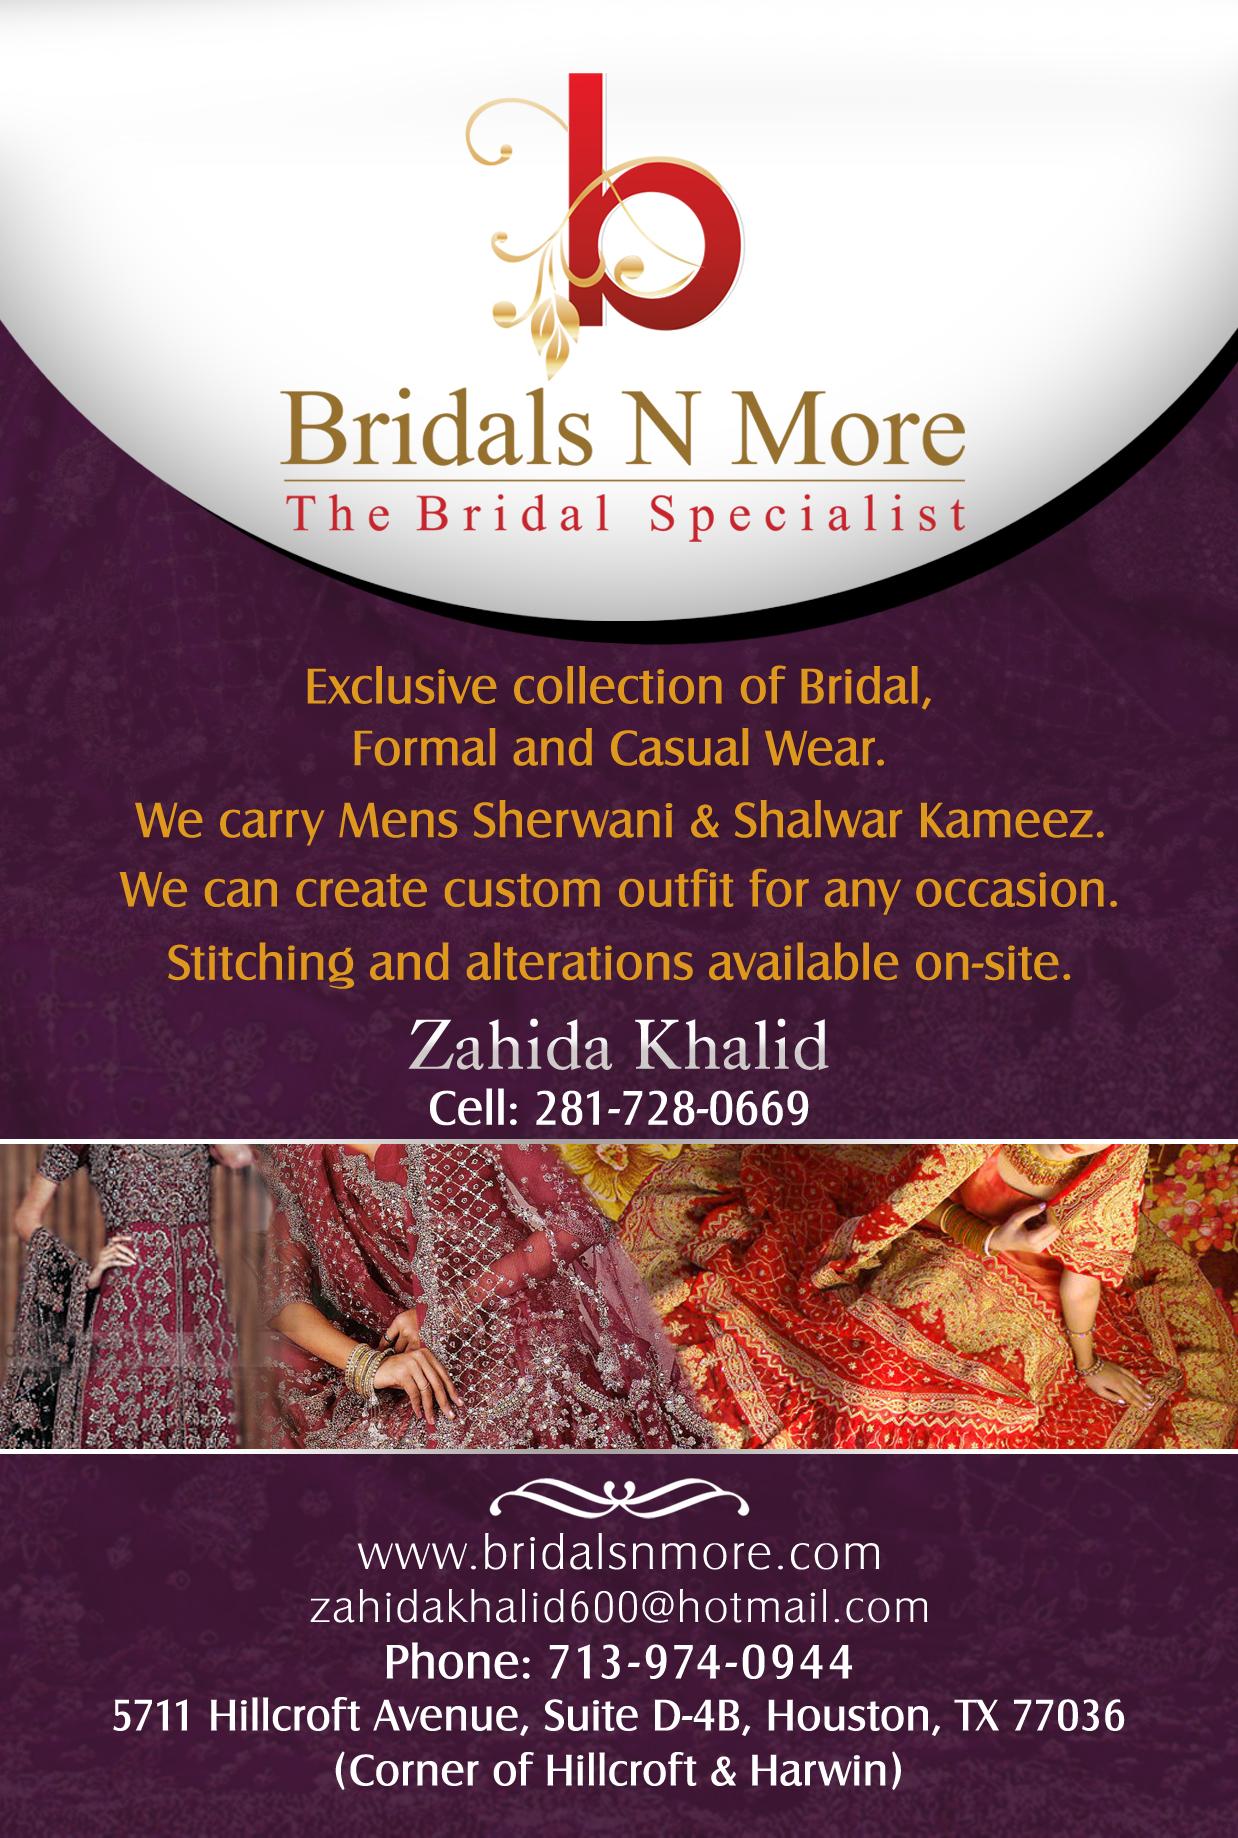 Bridal N More